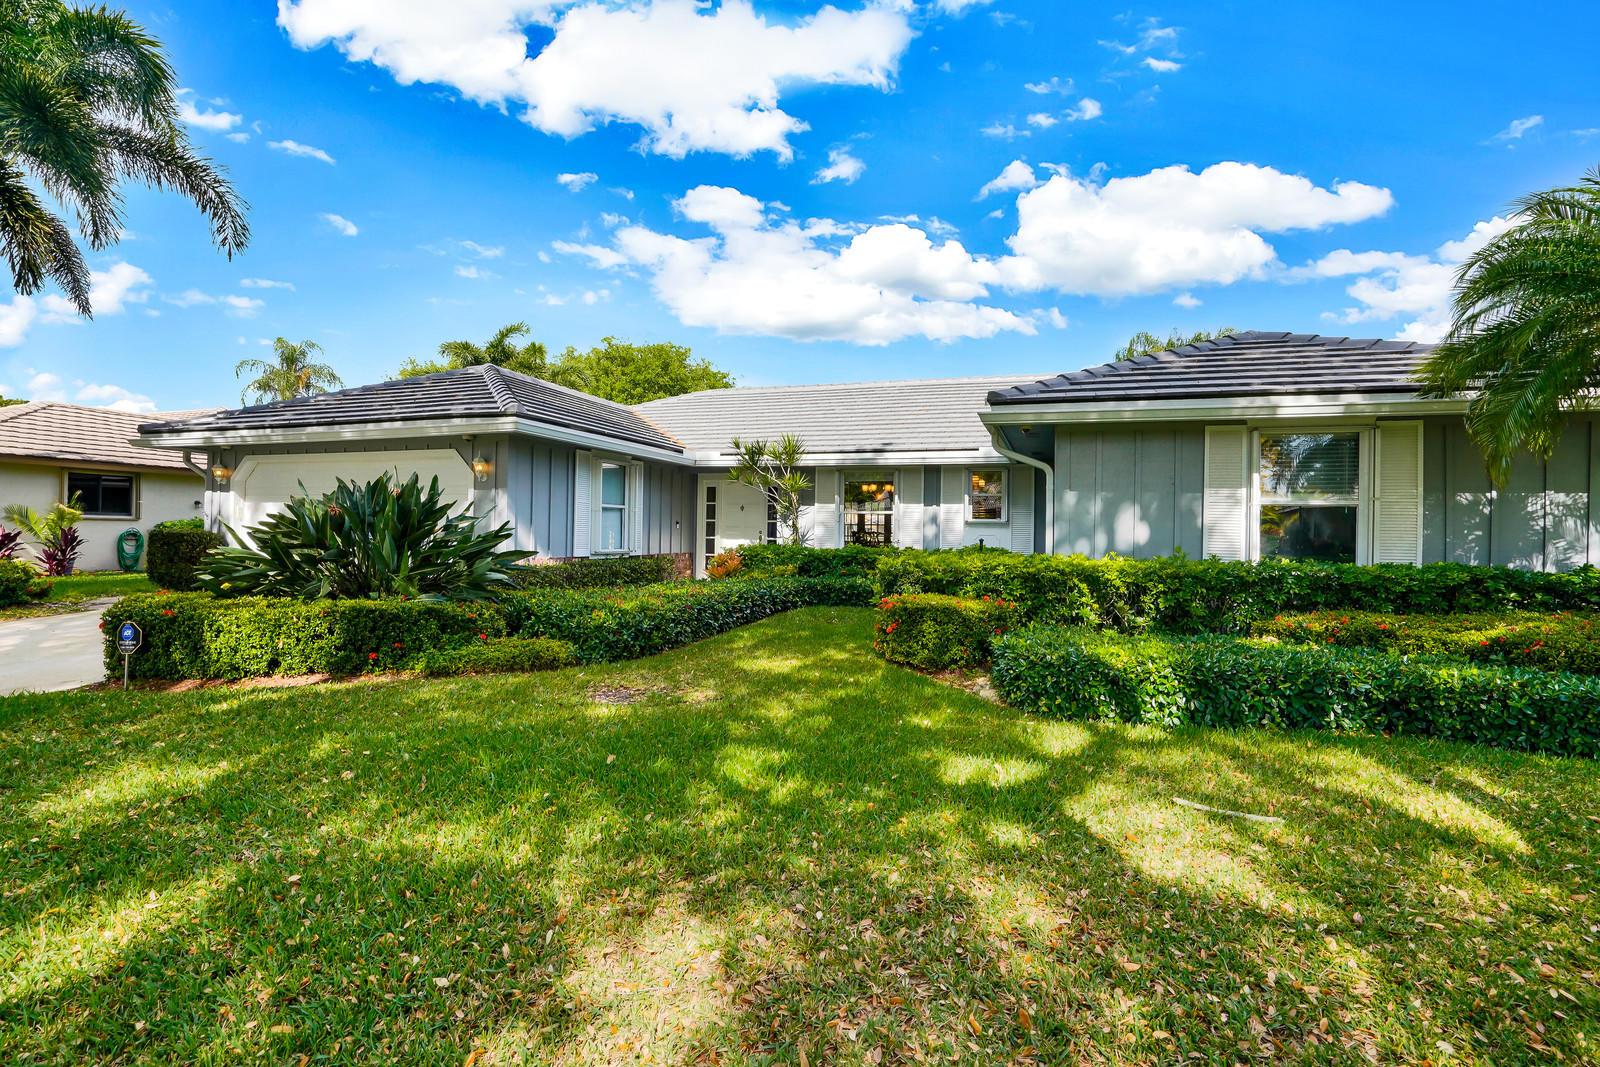 3487 Pine Haven Boca Raton FL 33431